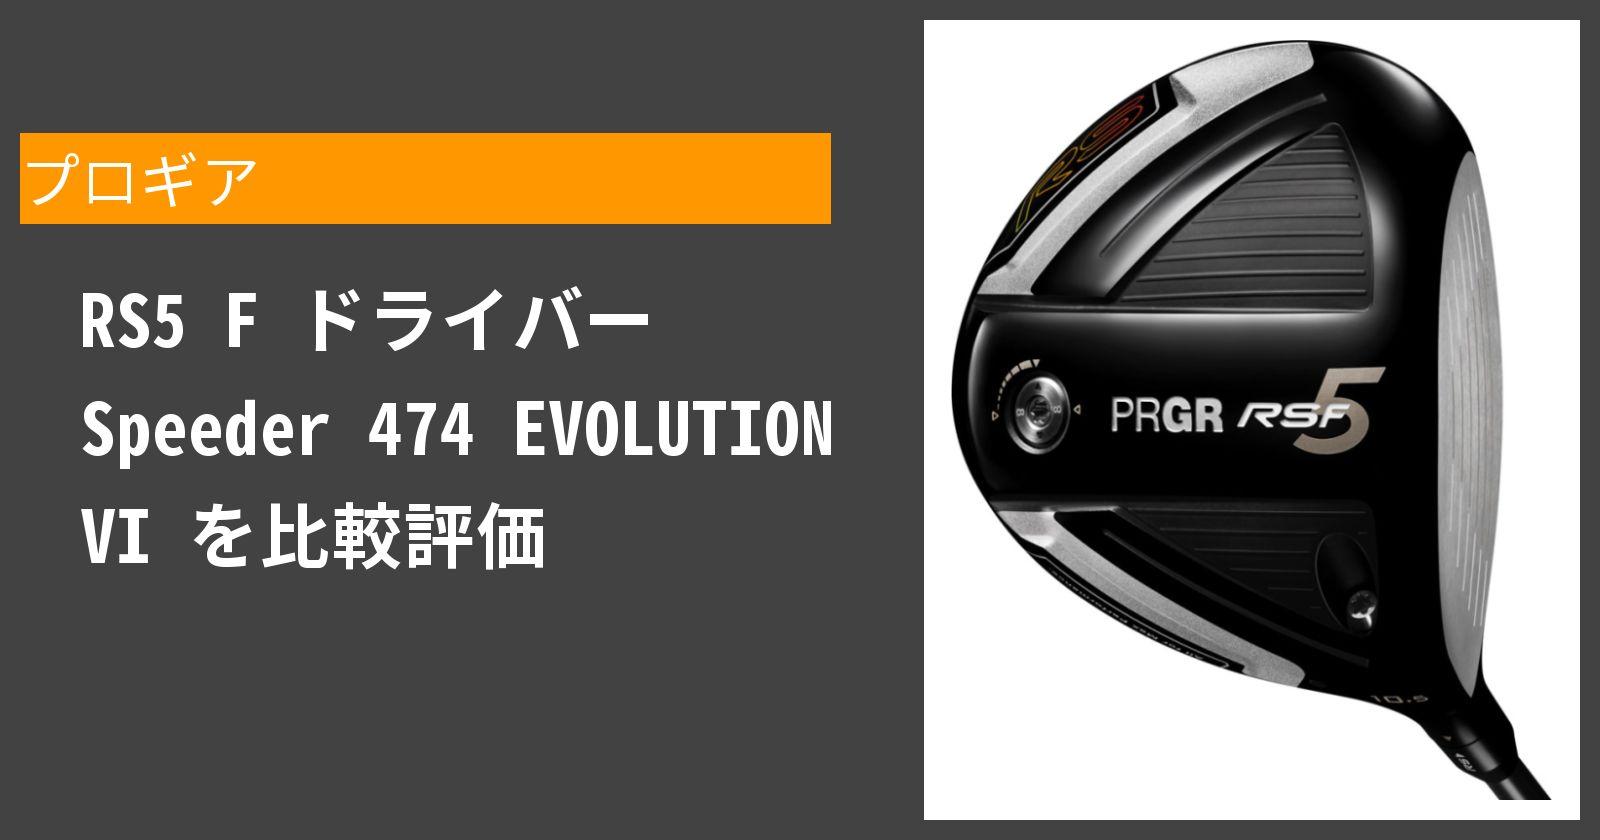 RS5 F ドライバー Speeder 474 EVOLUTION VIを徹底評価